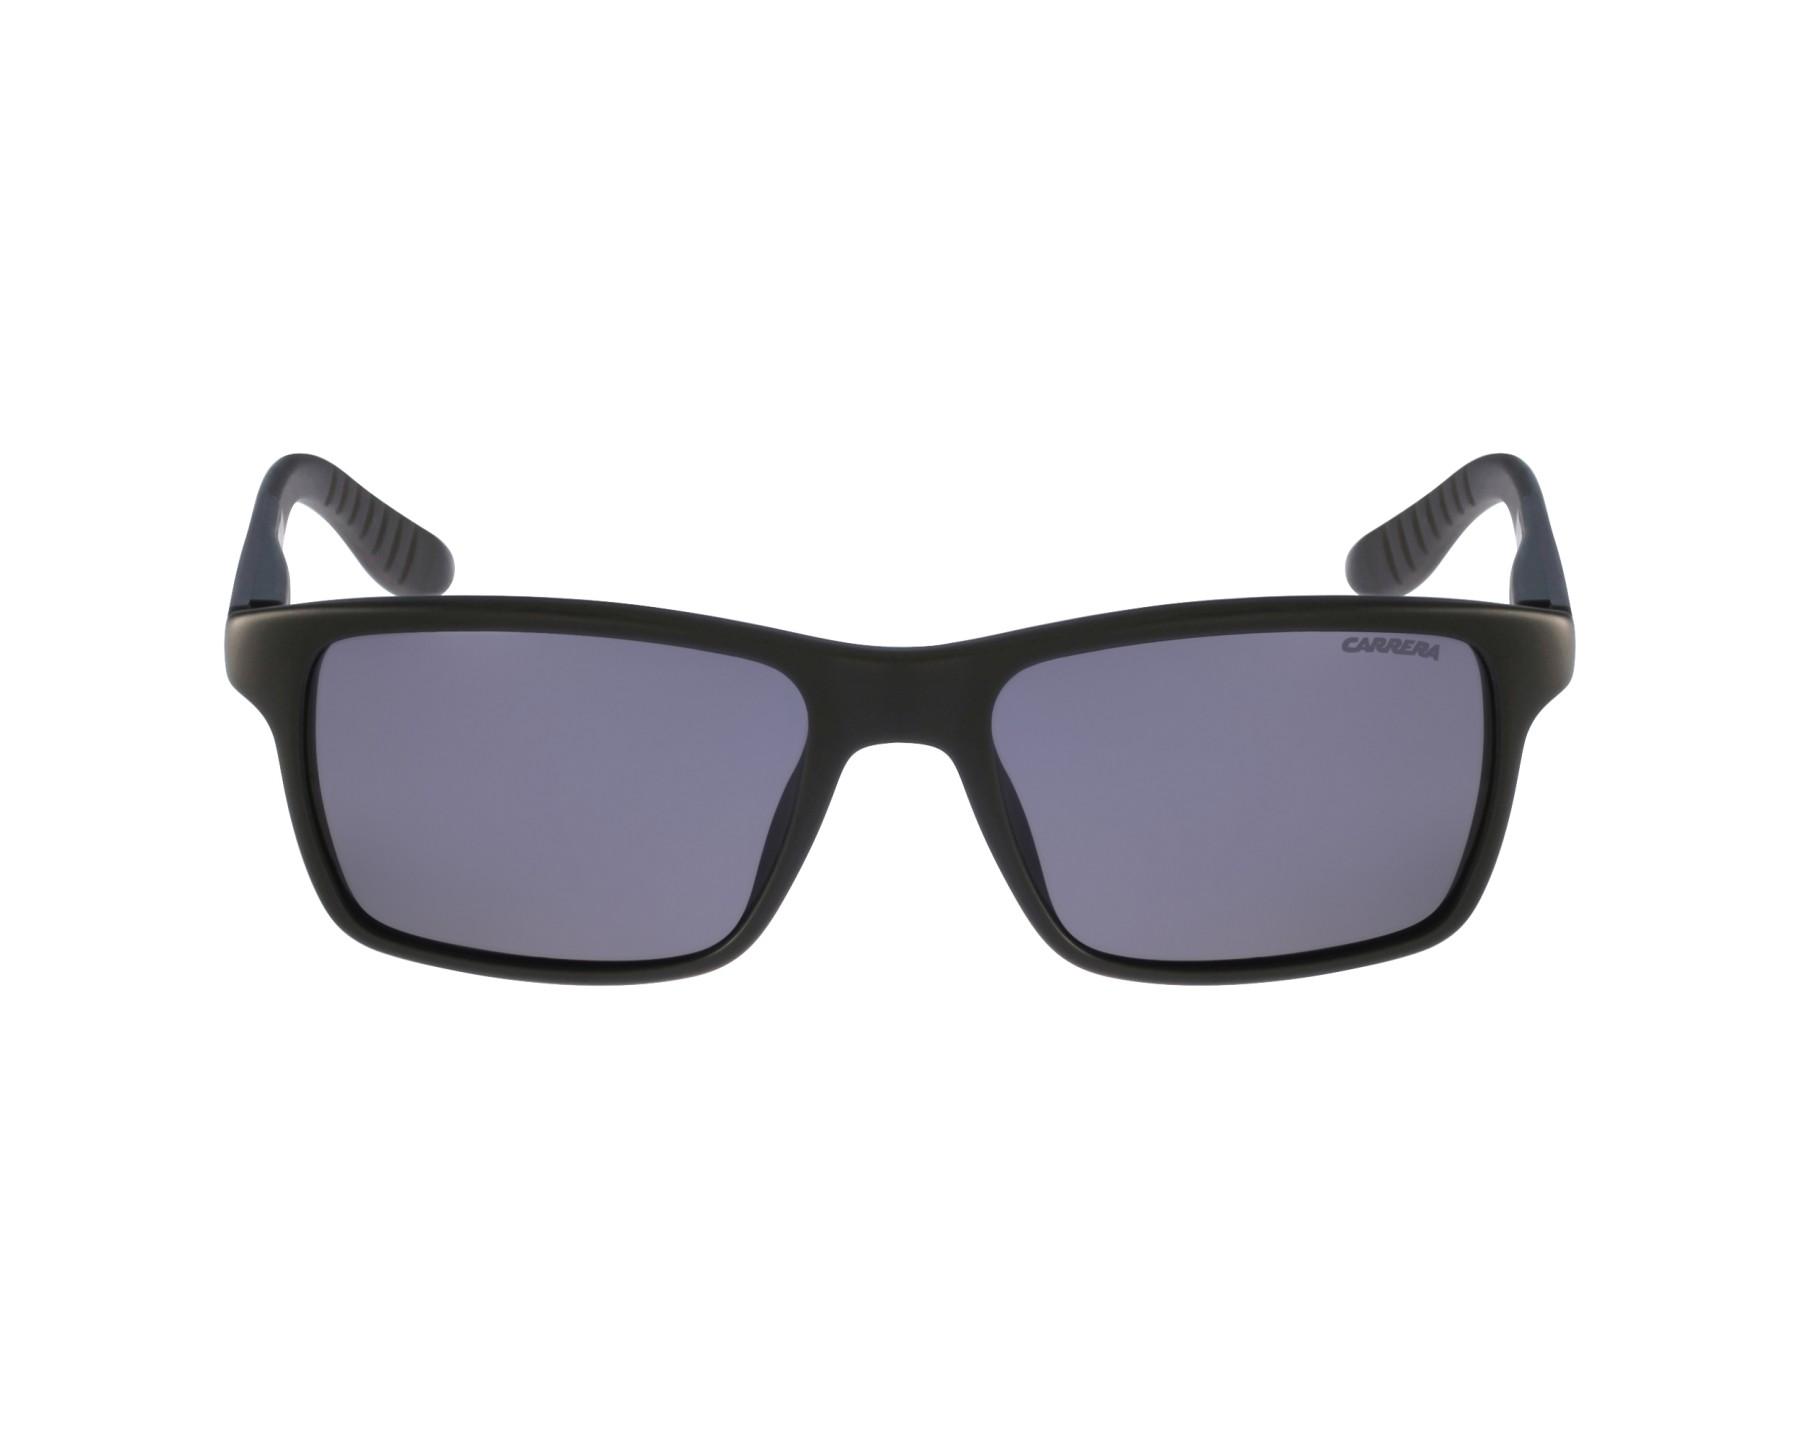 b8ccf84af1cd Polarized. Sunglasses Carrera 8002 DL5/TD - Black profile view